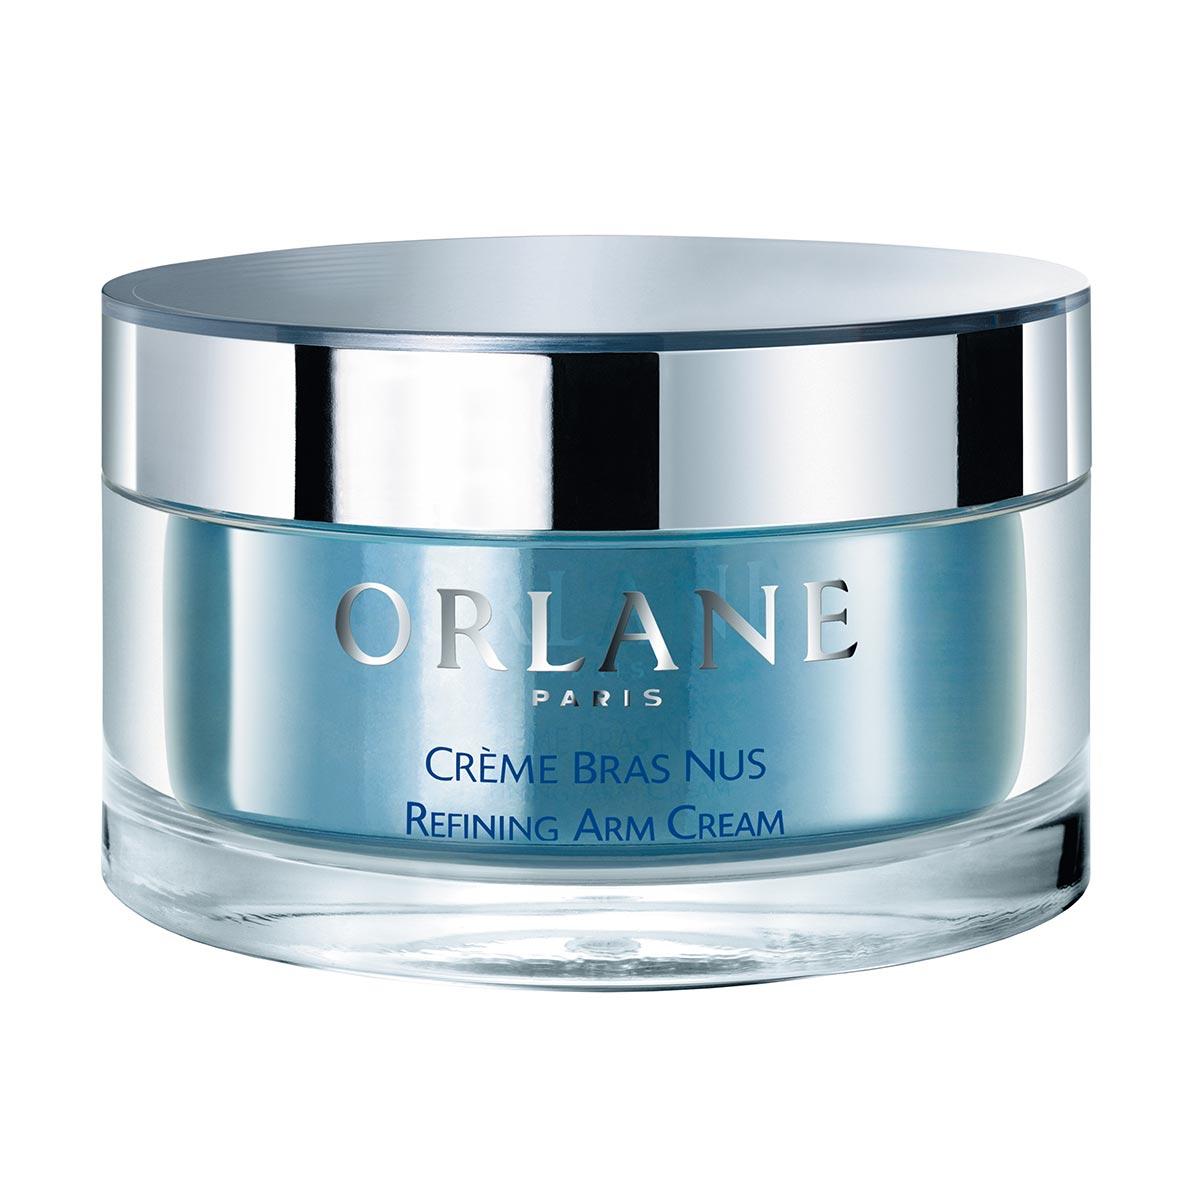 Orlane - Crème bras nus - Pot 200 ml